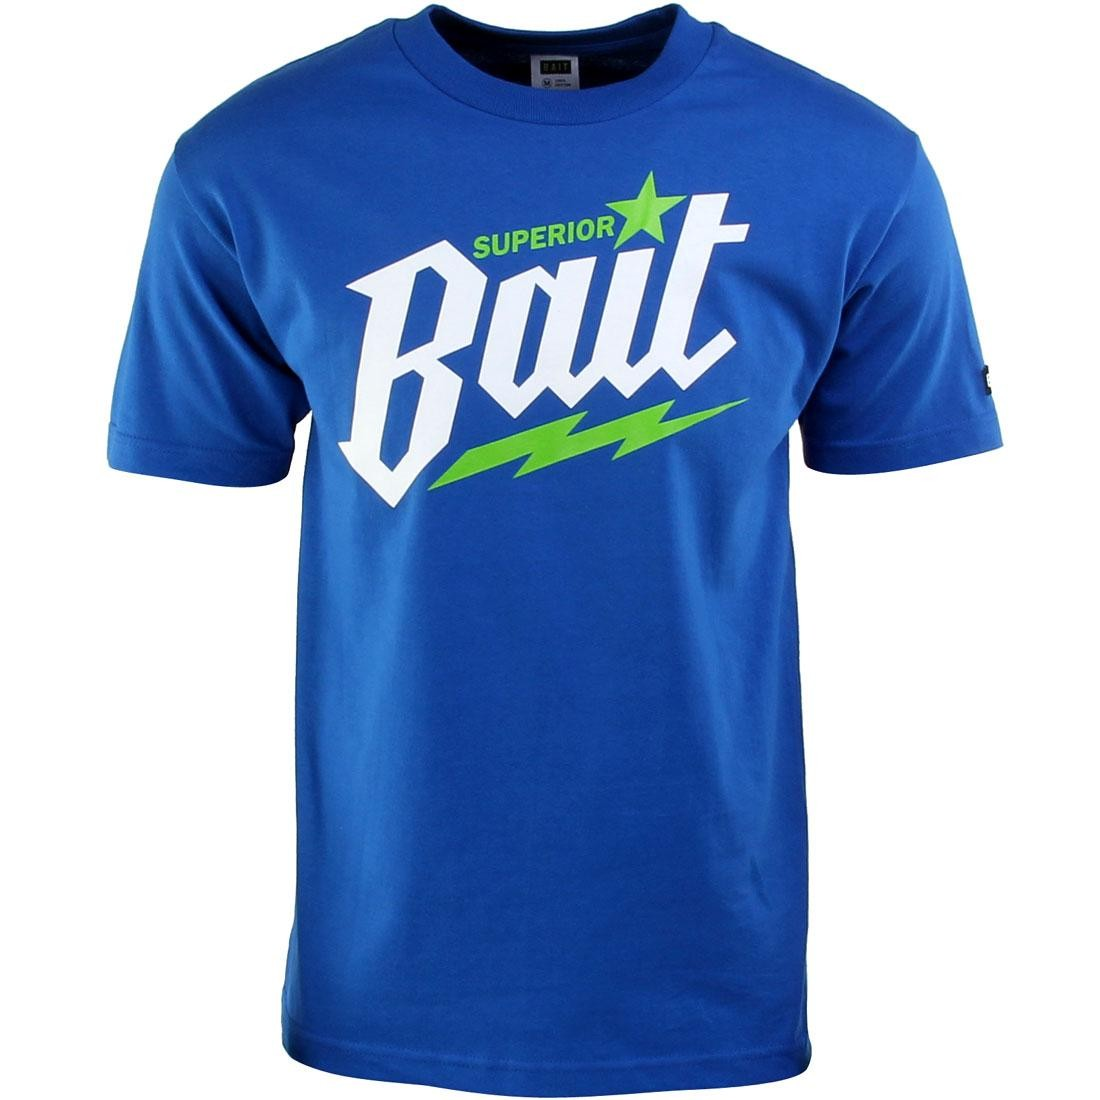 BAIT Superior BAIT Tee (blue / royal blue / white / green)